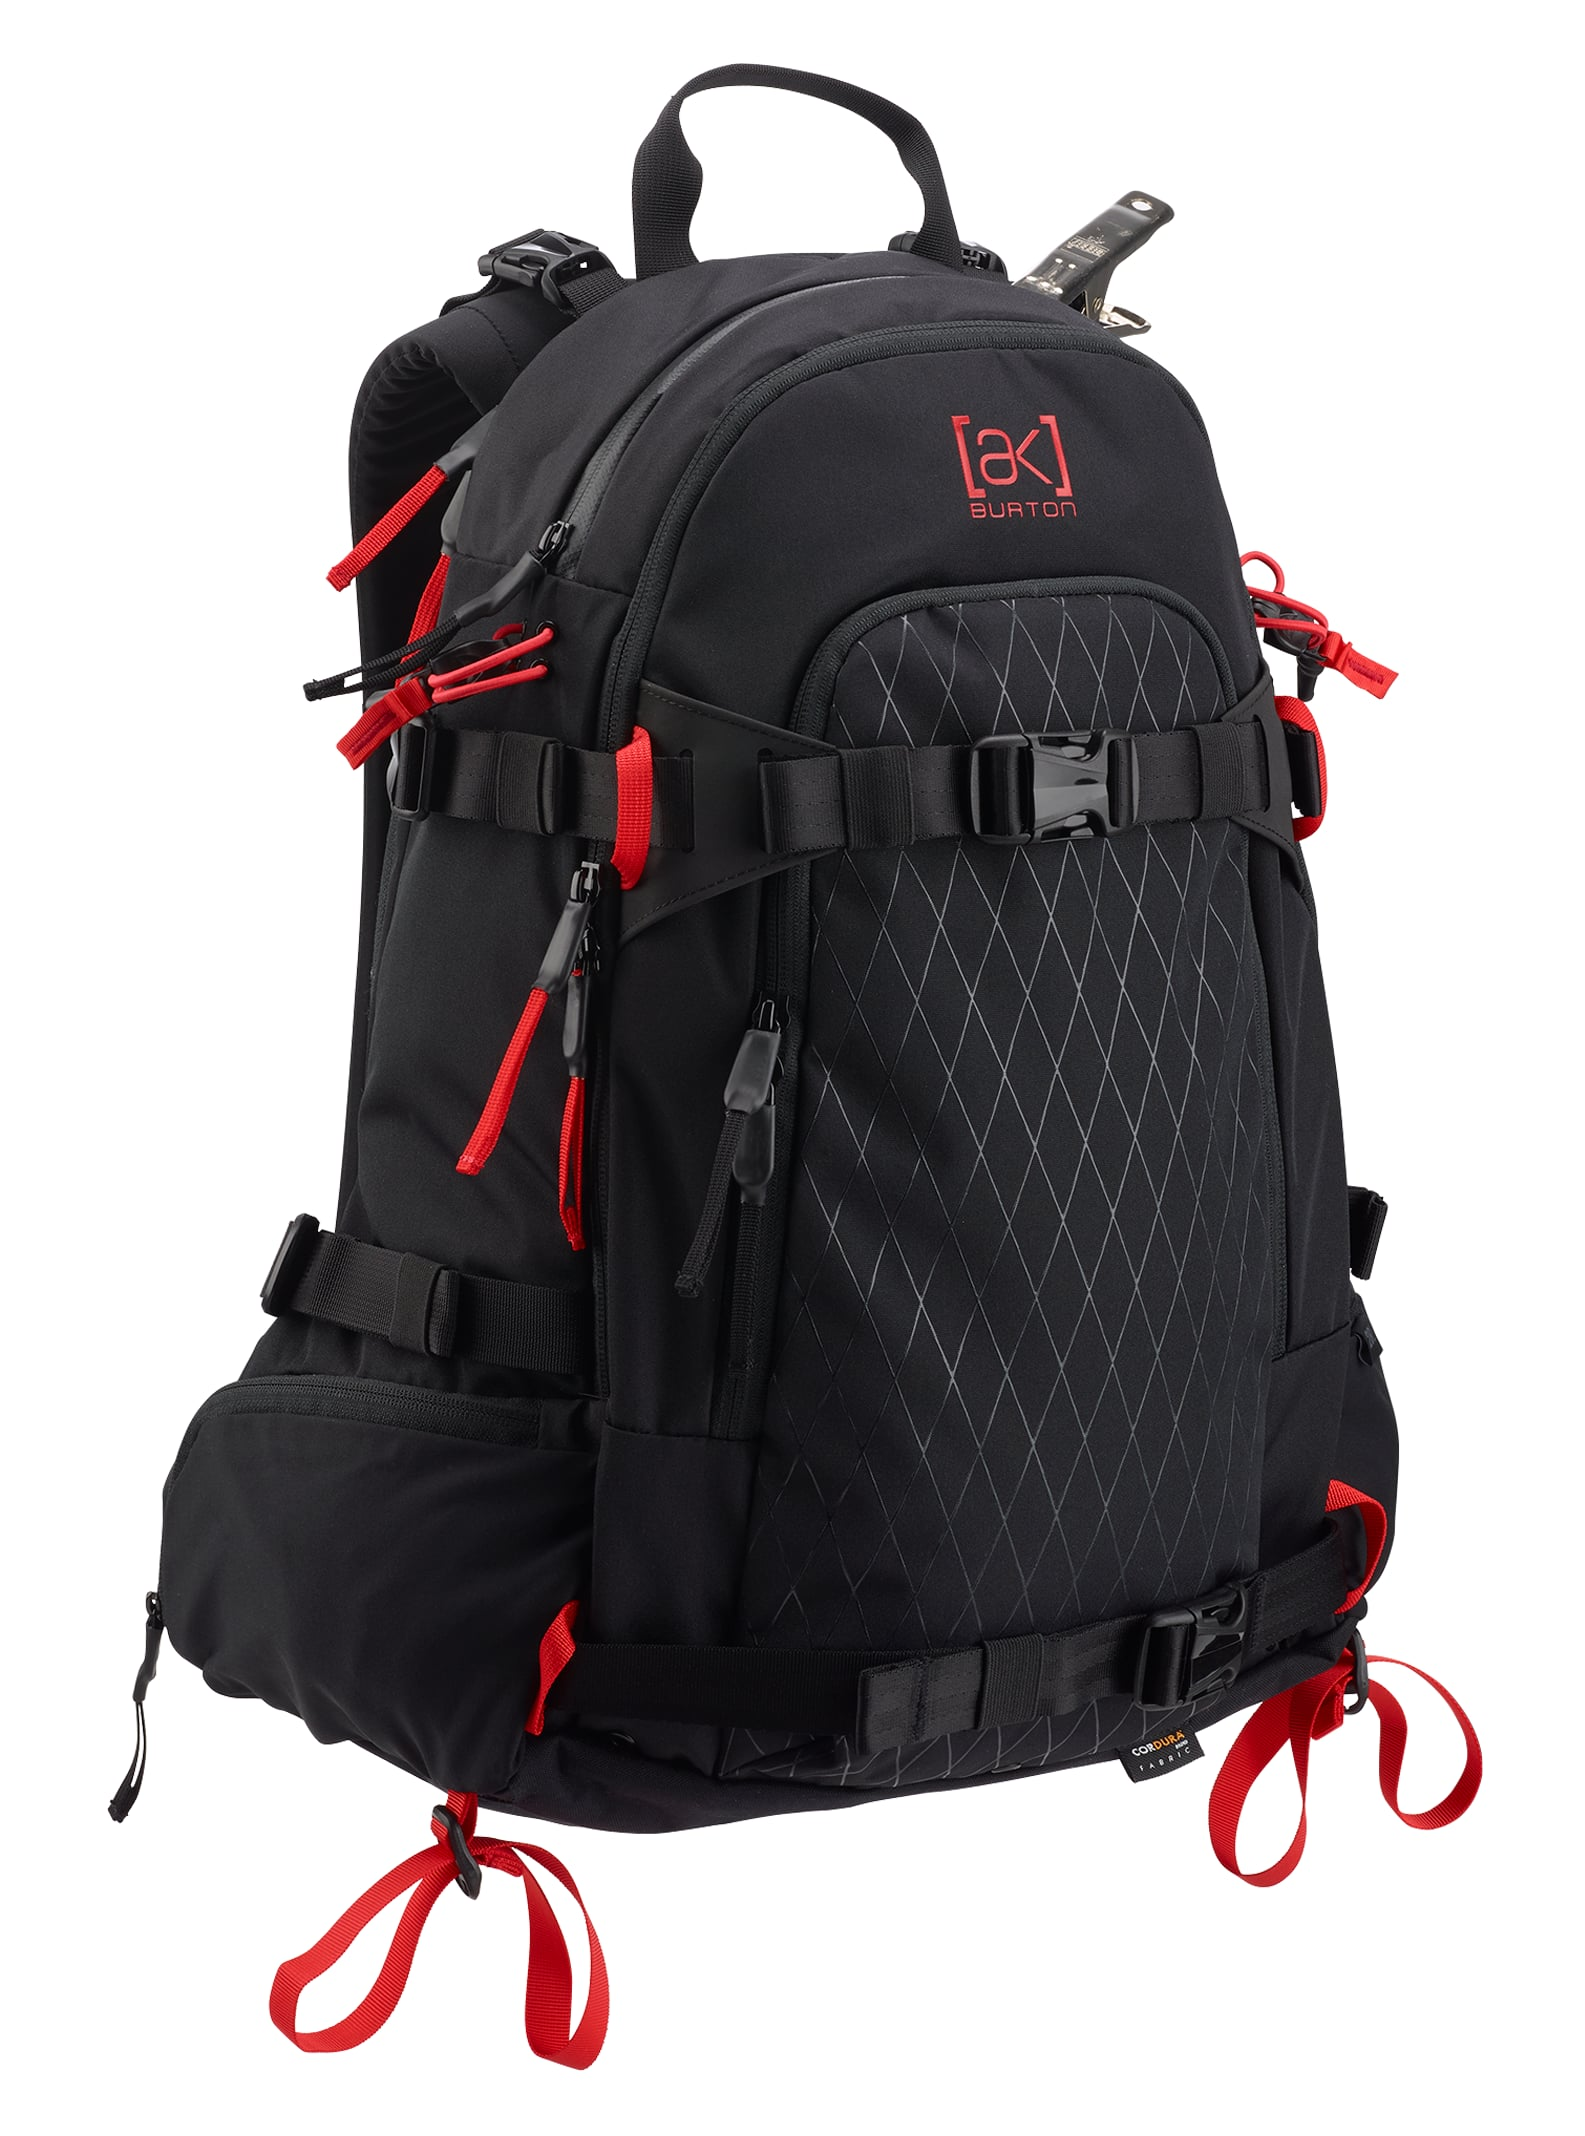 200fbbb90ba Burton [ak] Taft 28L Backpack   Products   Burton ak, Backpacks, Bags